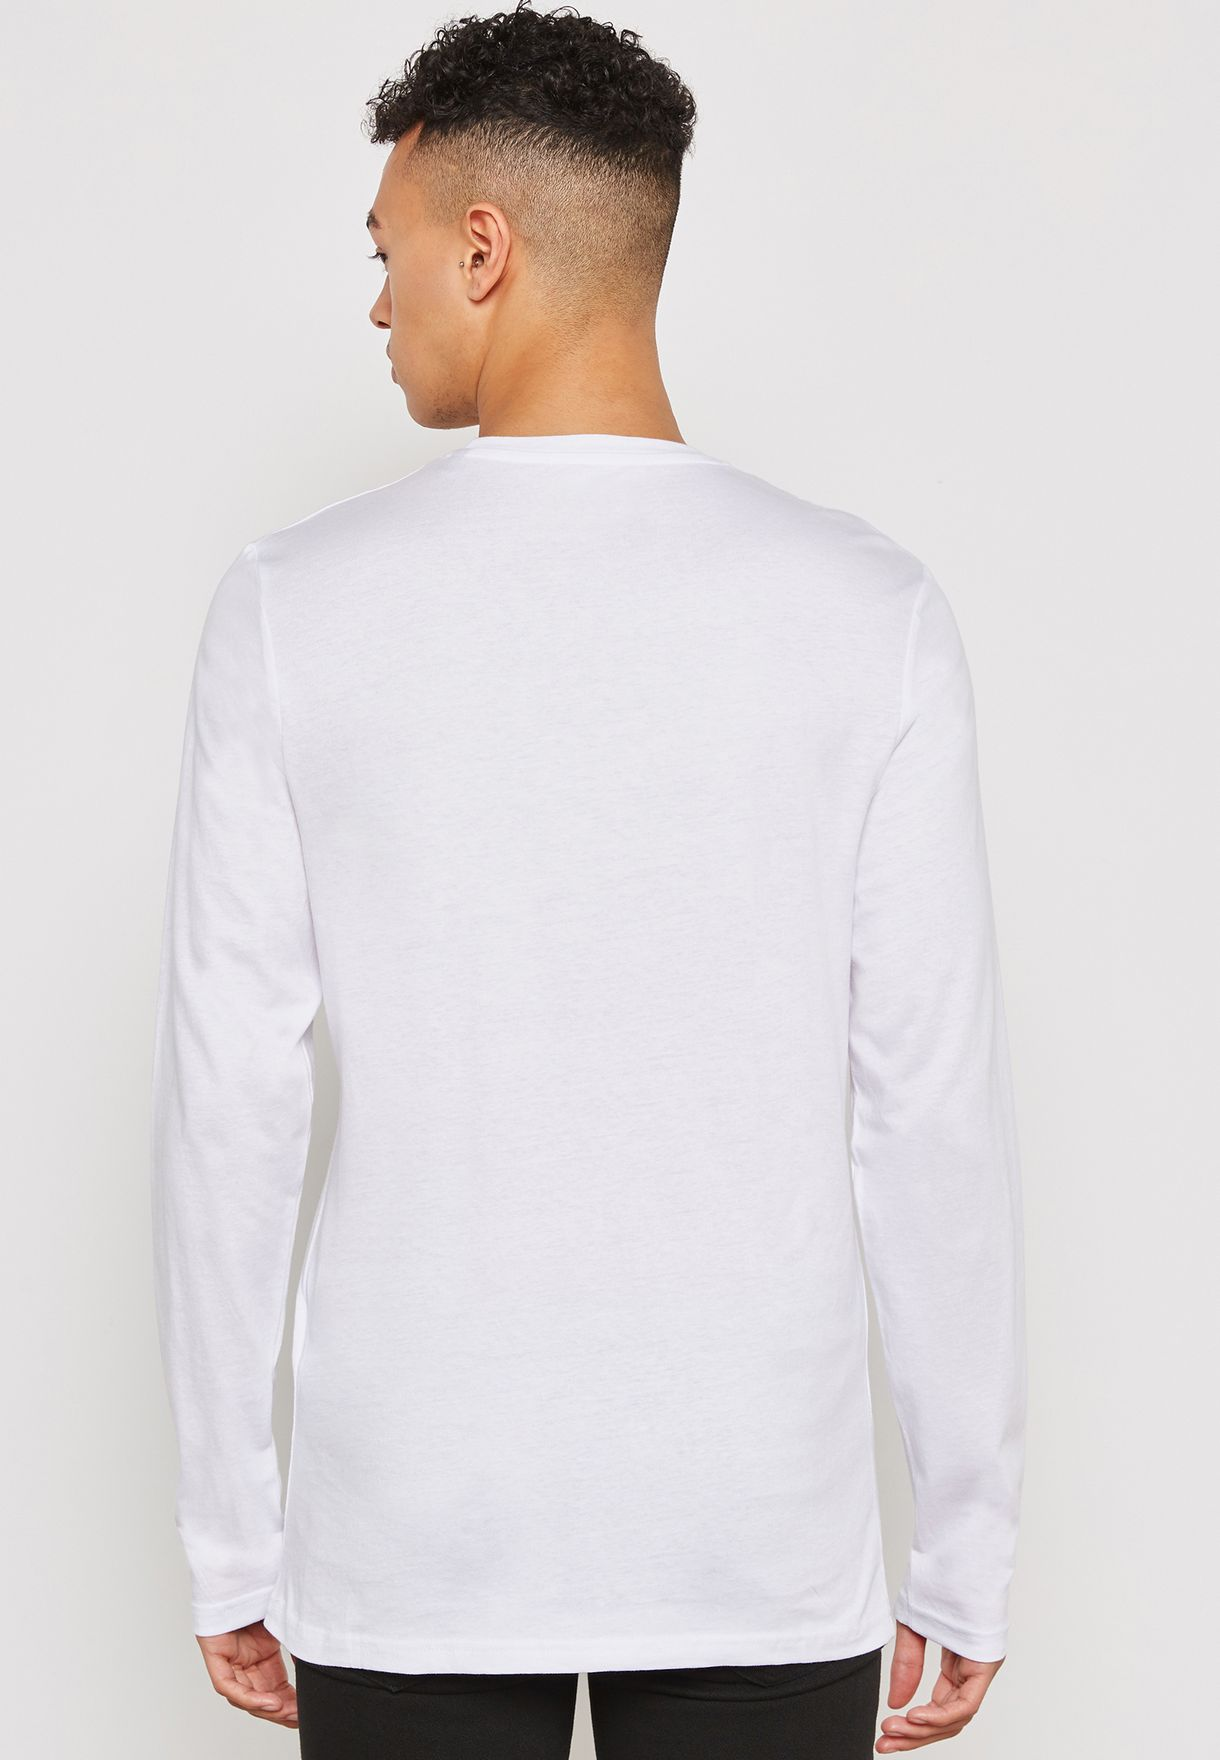 Art Fury T-Shirt